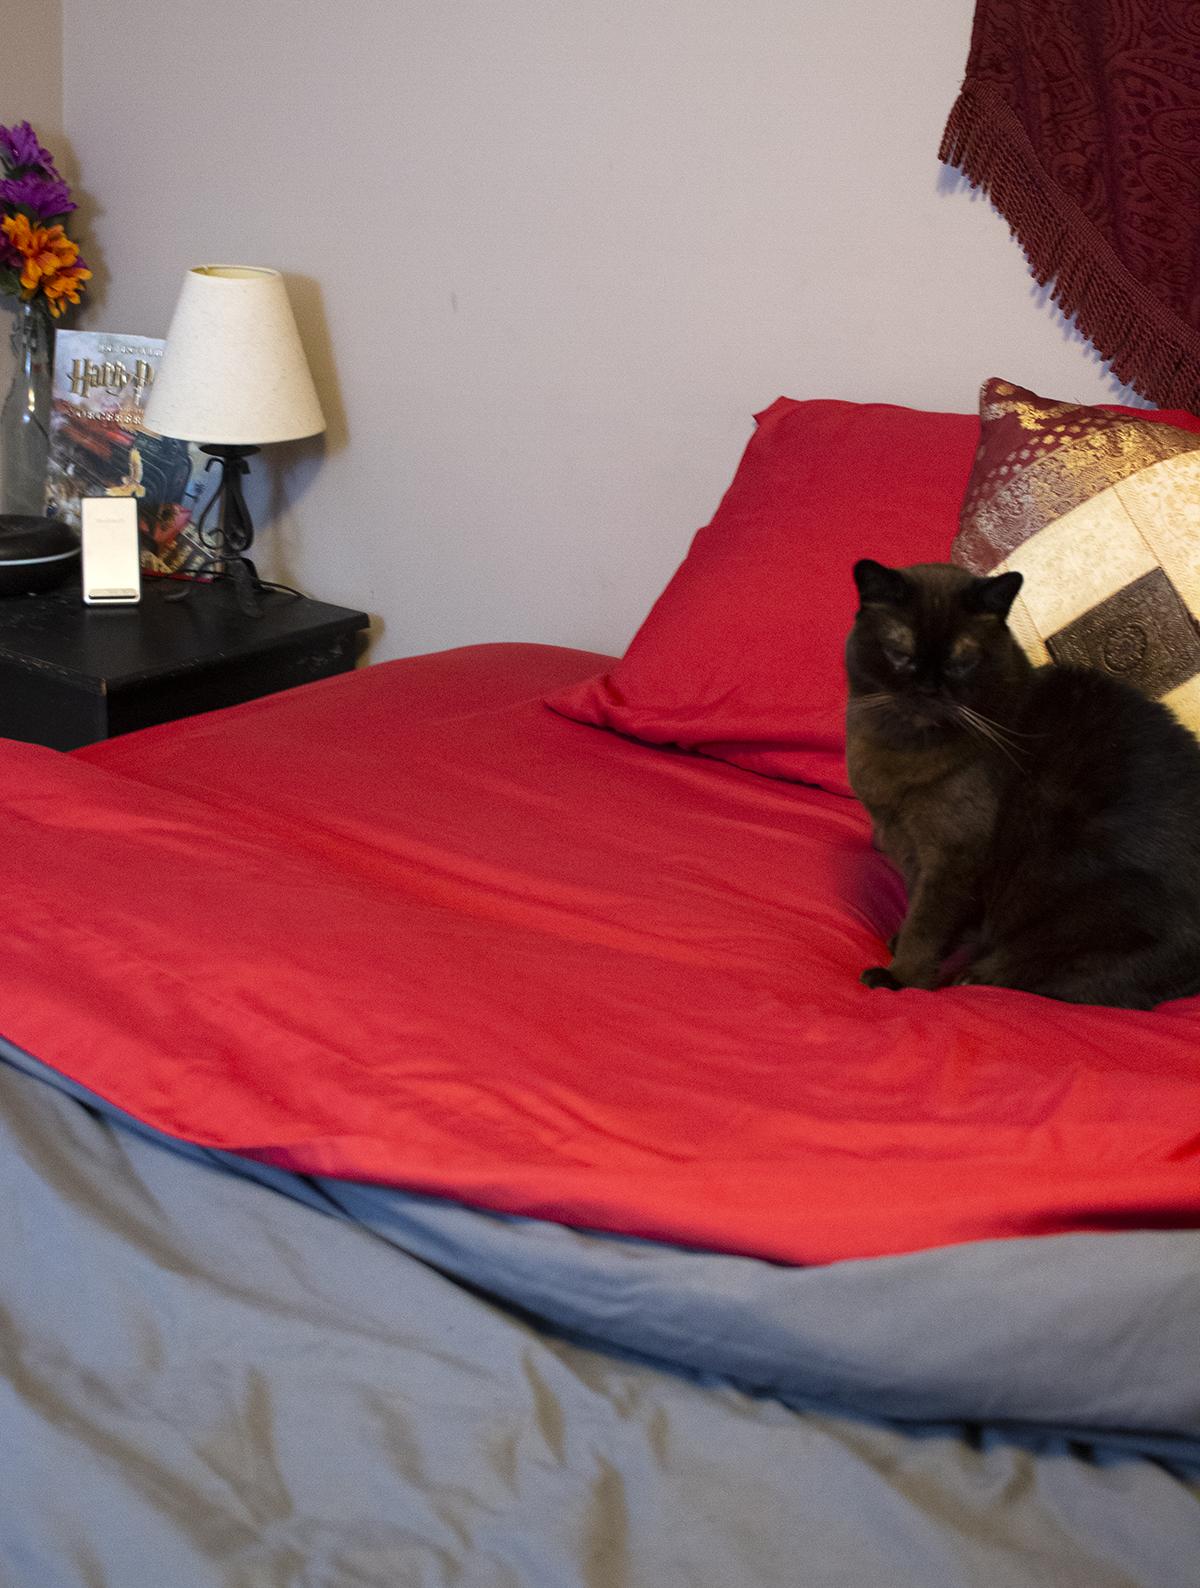 Cozy Comfort PeachSkinSheets